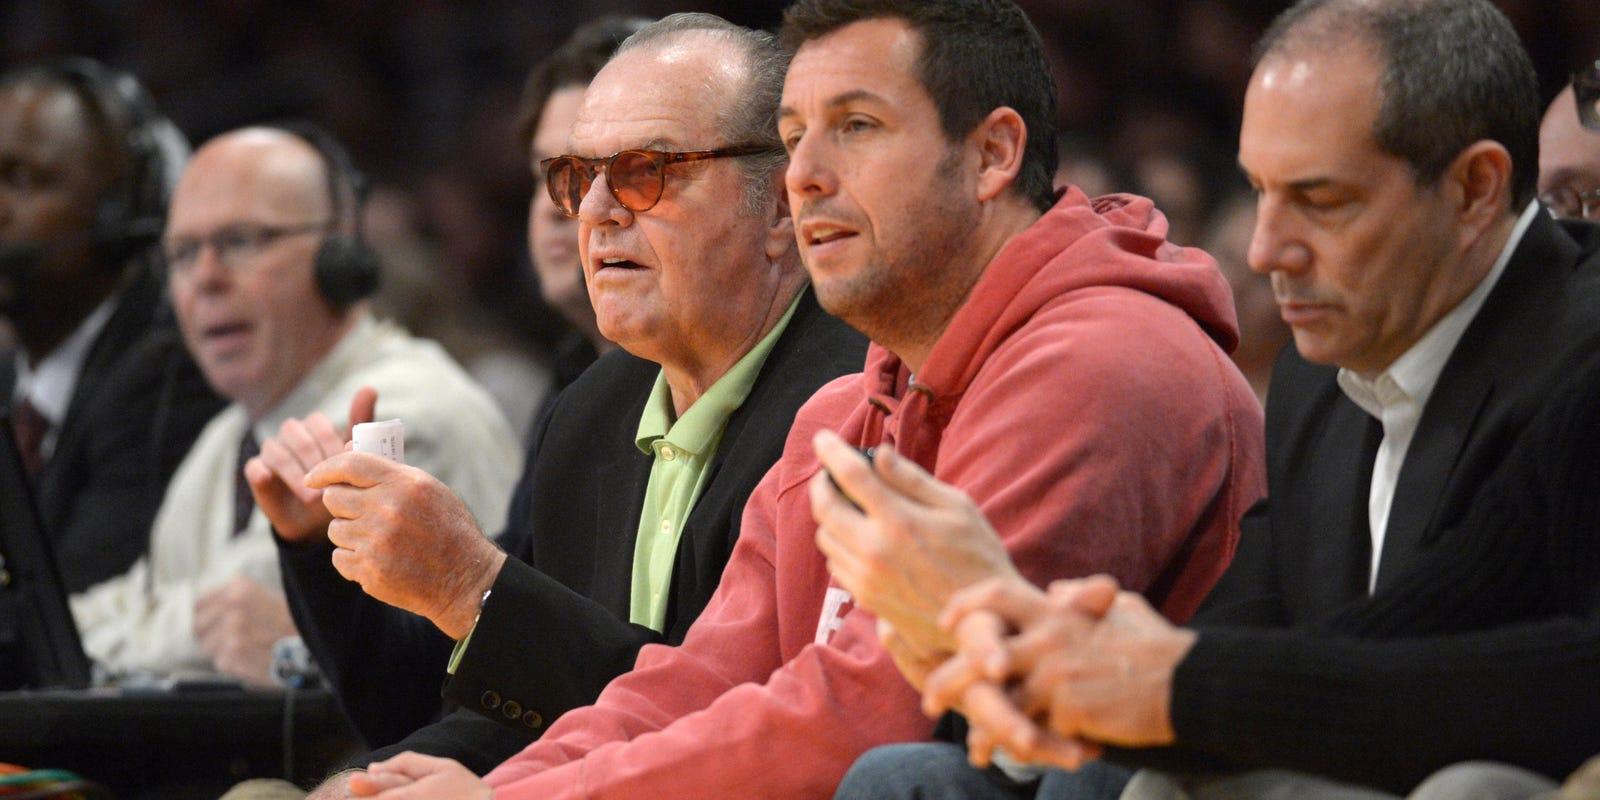 Jack Nicholson Adam Sandler Walk Out Early On Lakers